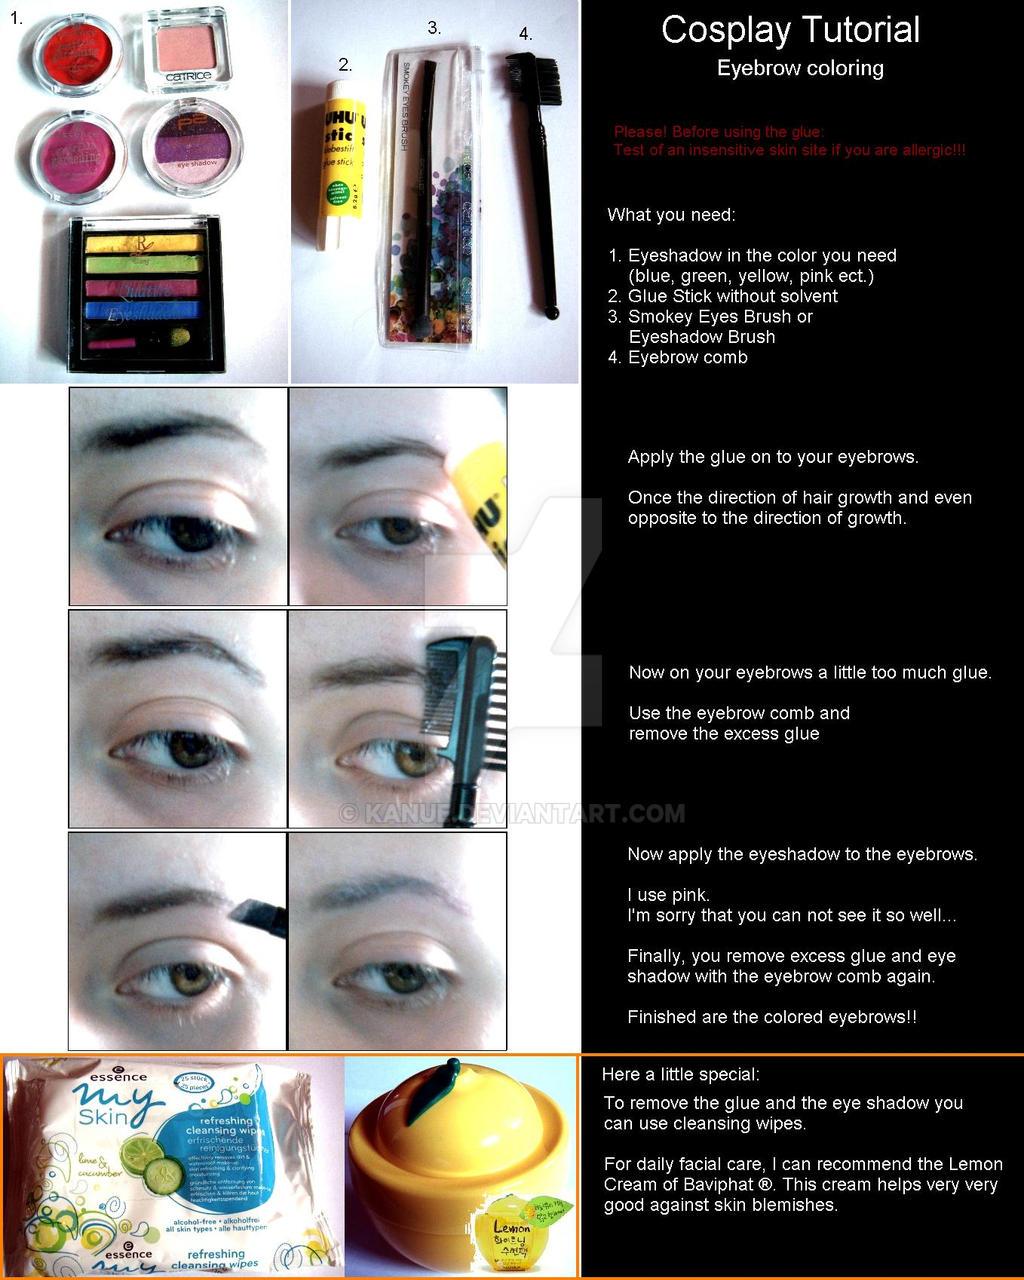 Tutorial - Eyebrow Coloring by Kanue